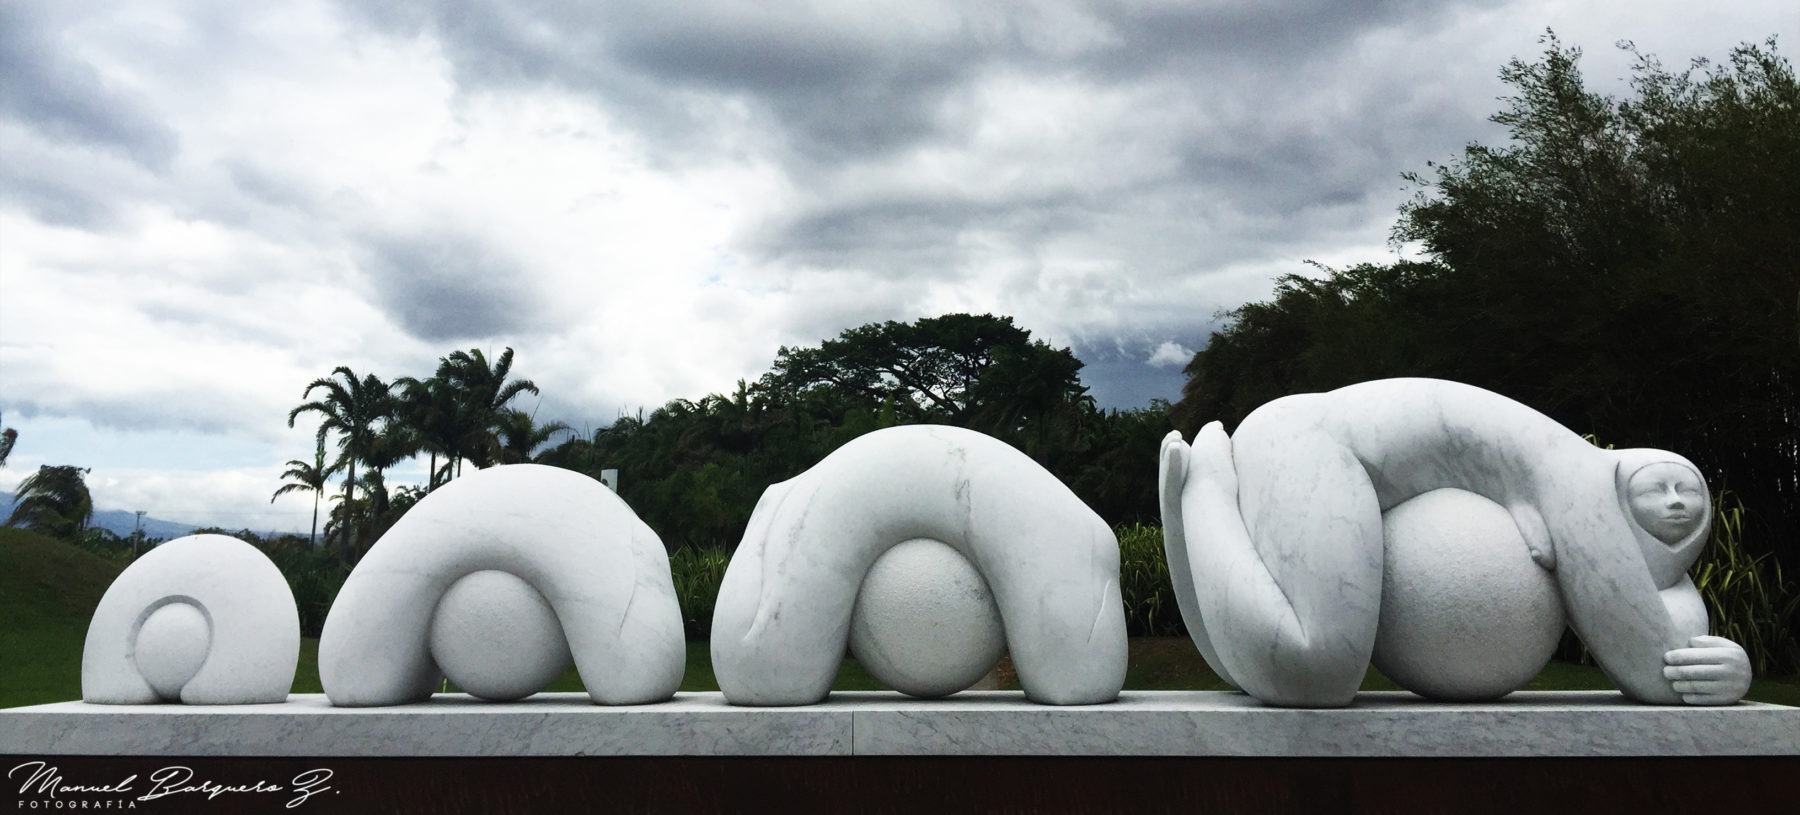 deredia Costa Rica